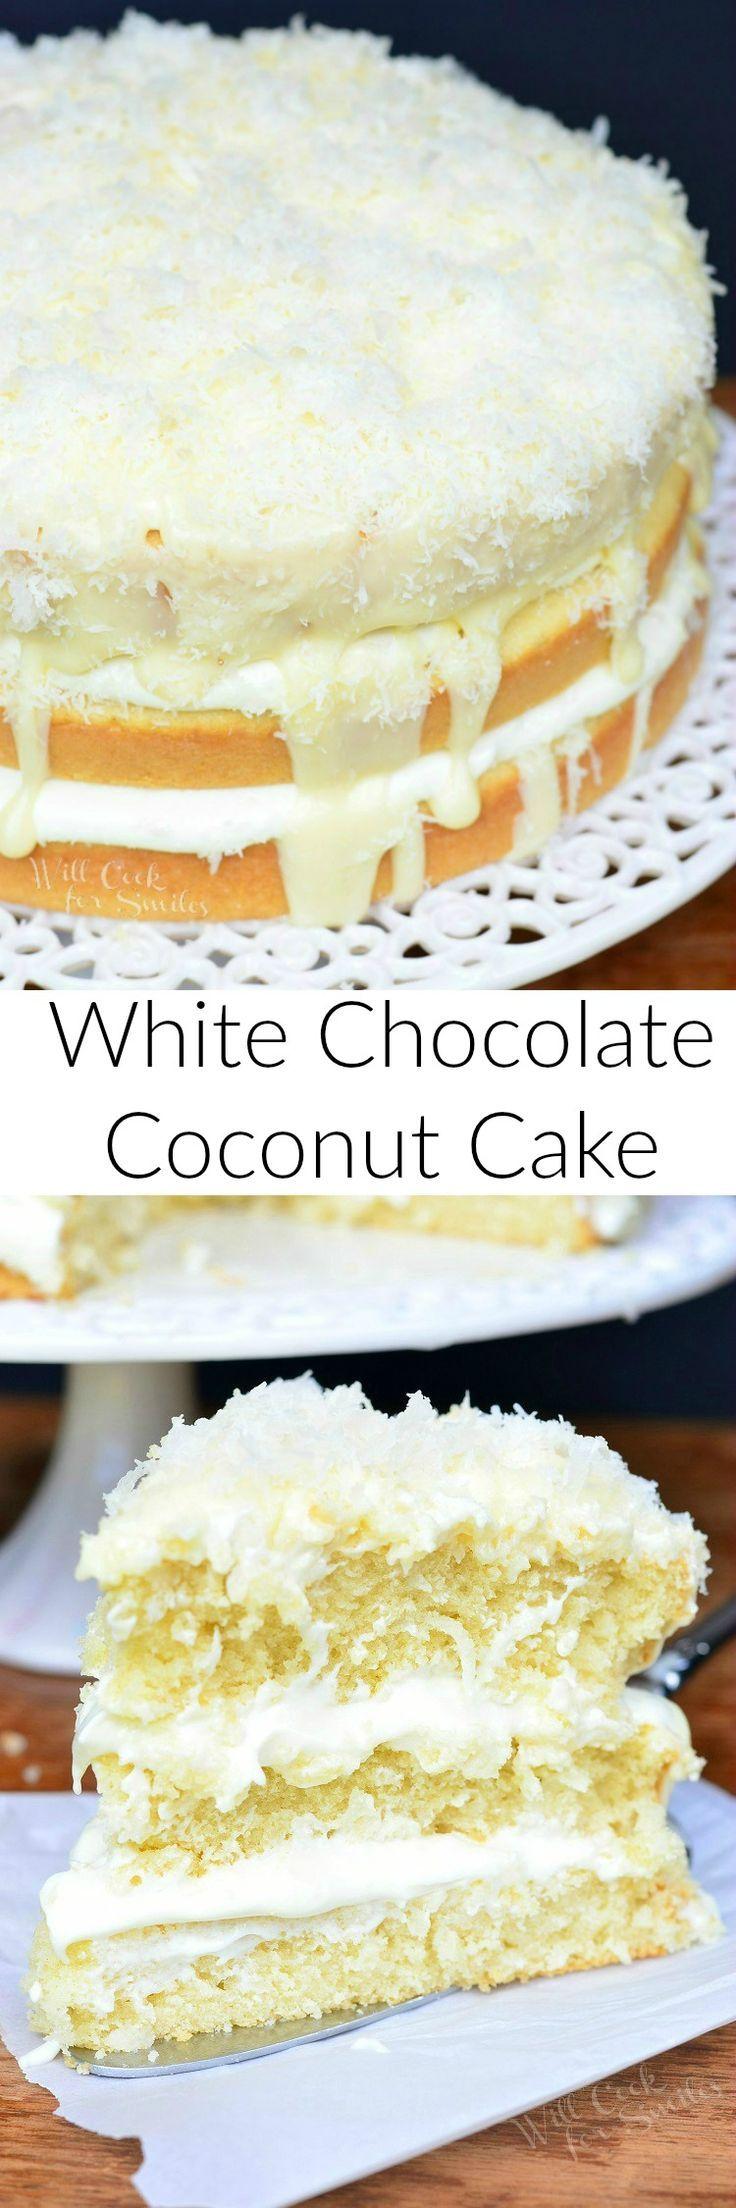 White Chocolate Coconut Cake. Soft, moist layered coconut cake with THE BEST white chocolate frosting and white chocolate ganache.